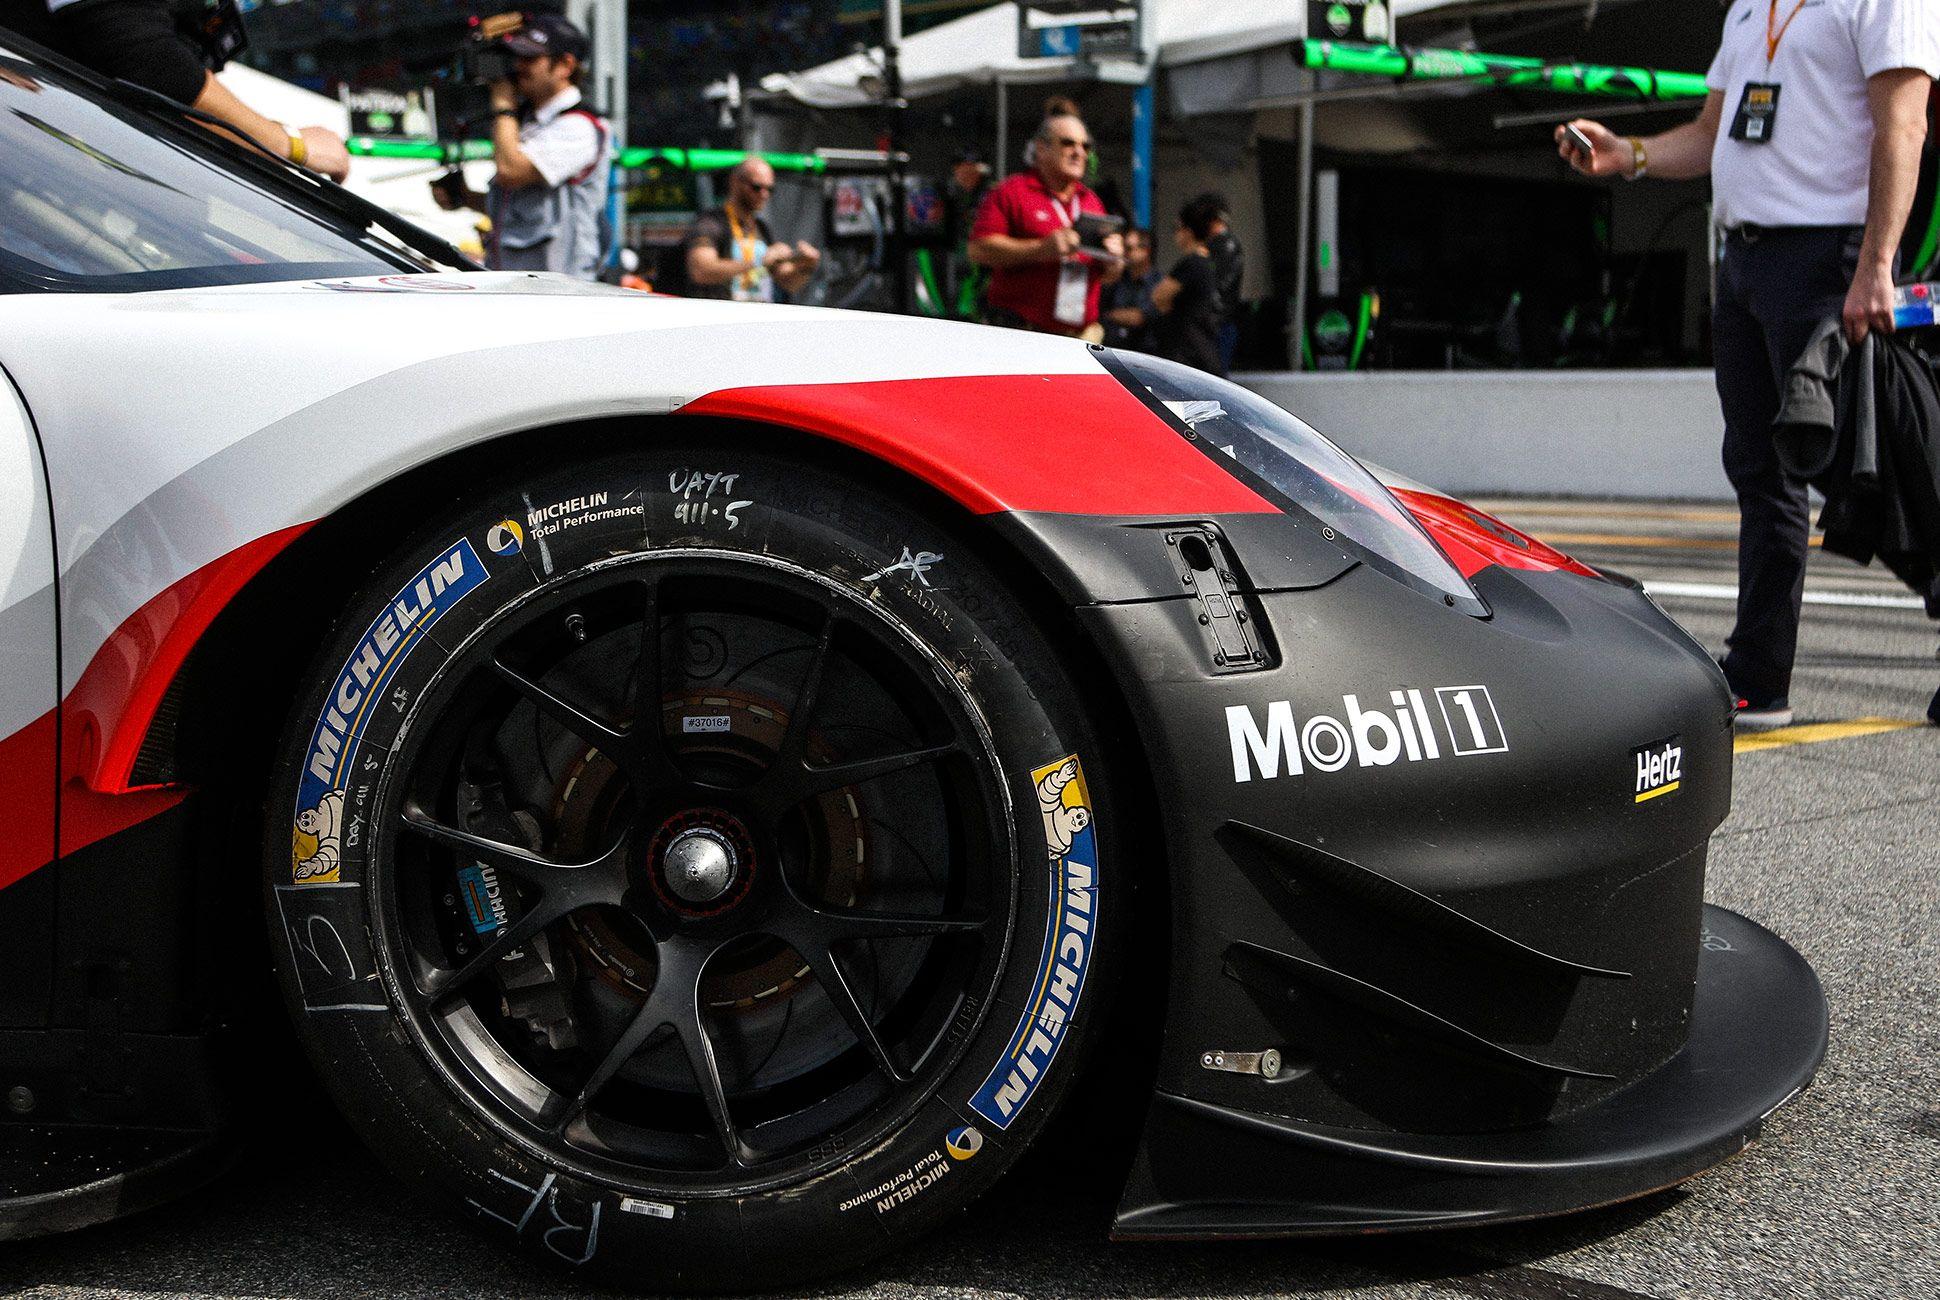 Best-Sports-Cars-of-2018-Daytona-24-Hours-gear-patrol-Porsche-911-RSR-2